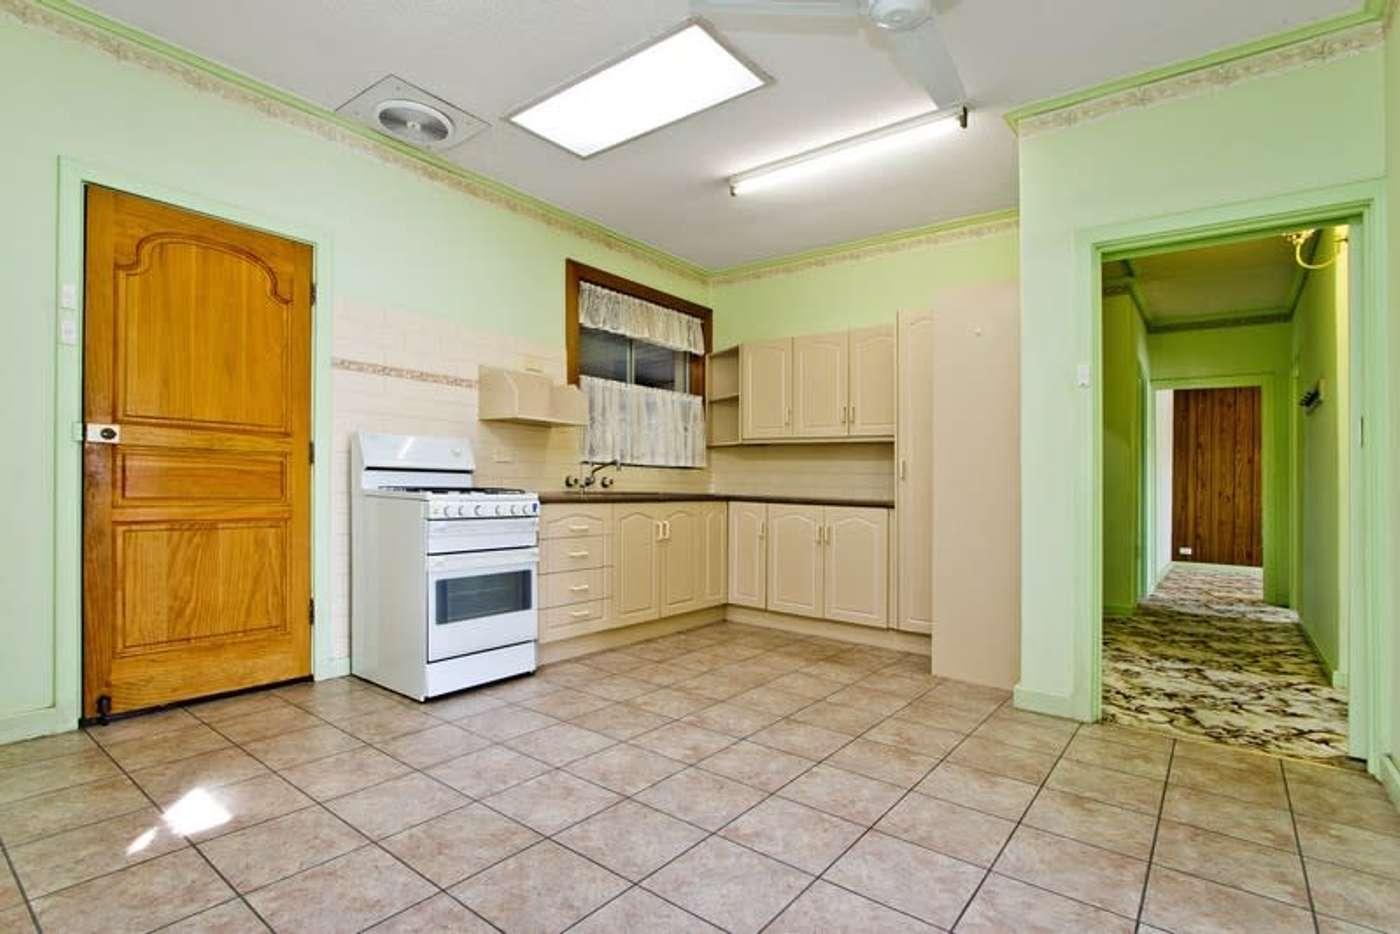 Sixth view of Homely house listing, 30 Sunshine Avenue, Warradale SA 5046